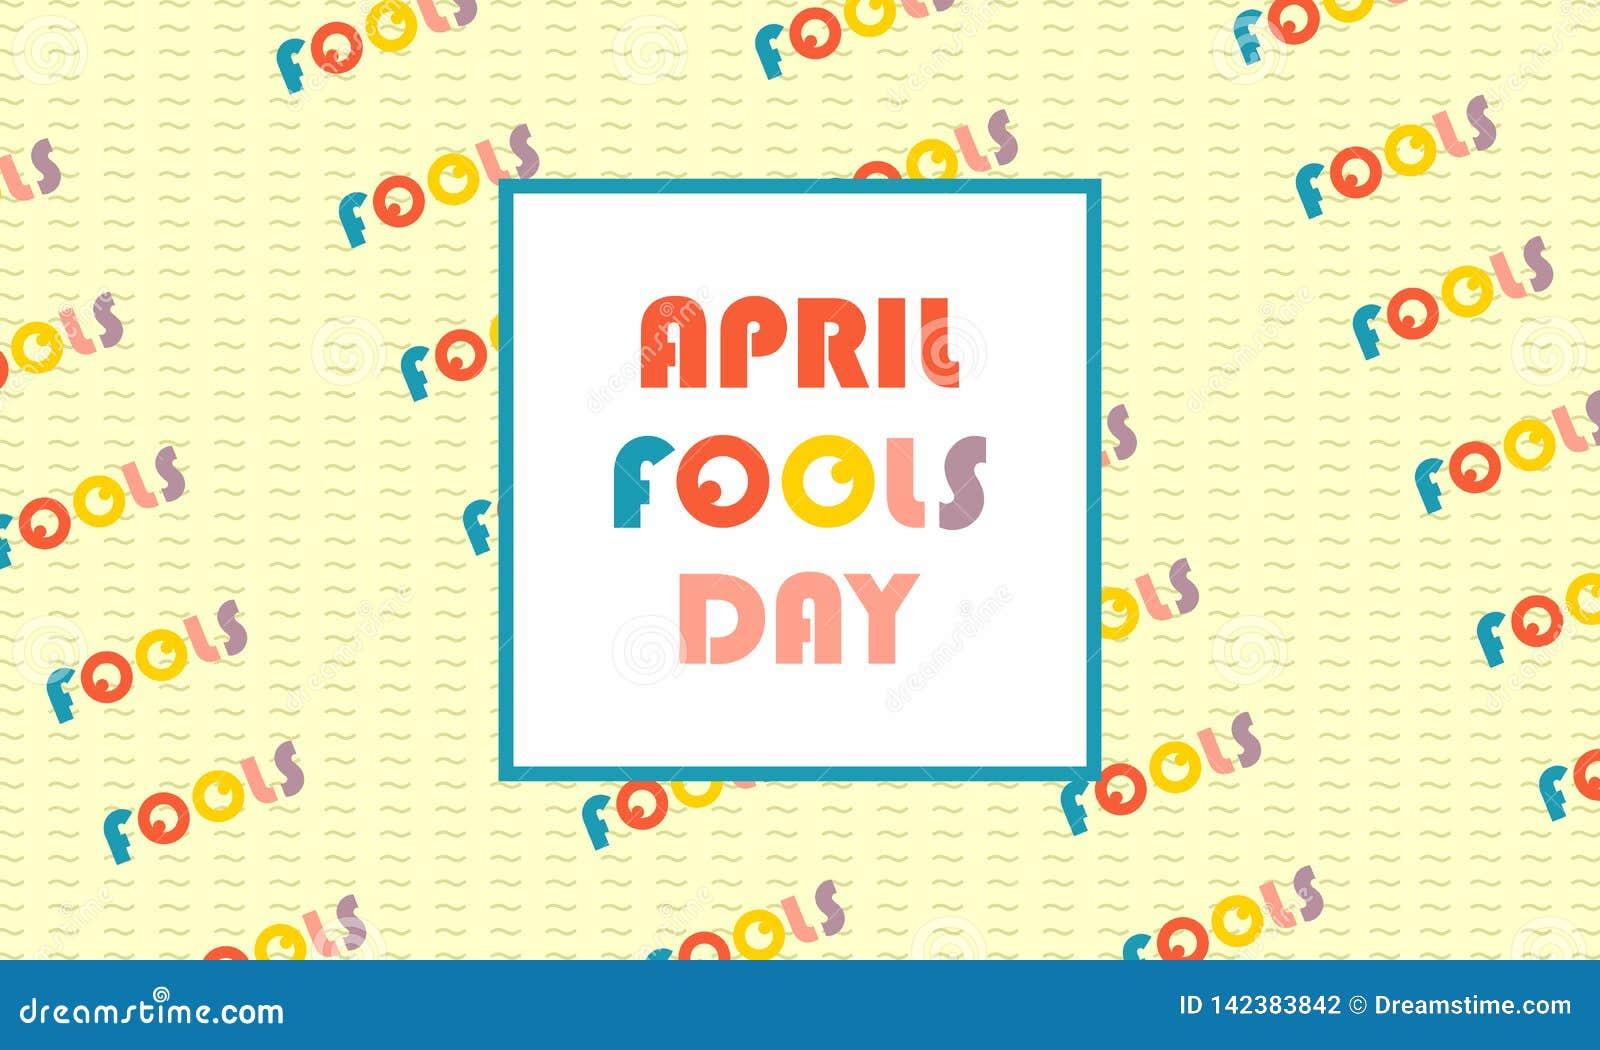 Greeting april fools day